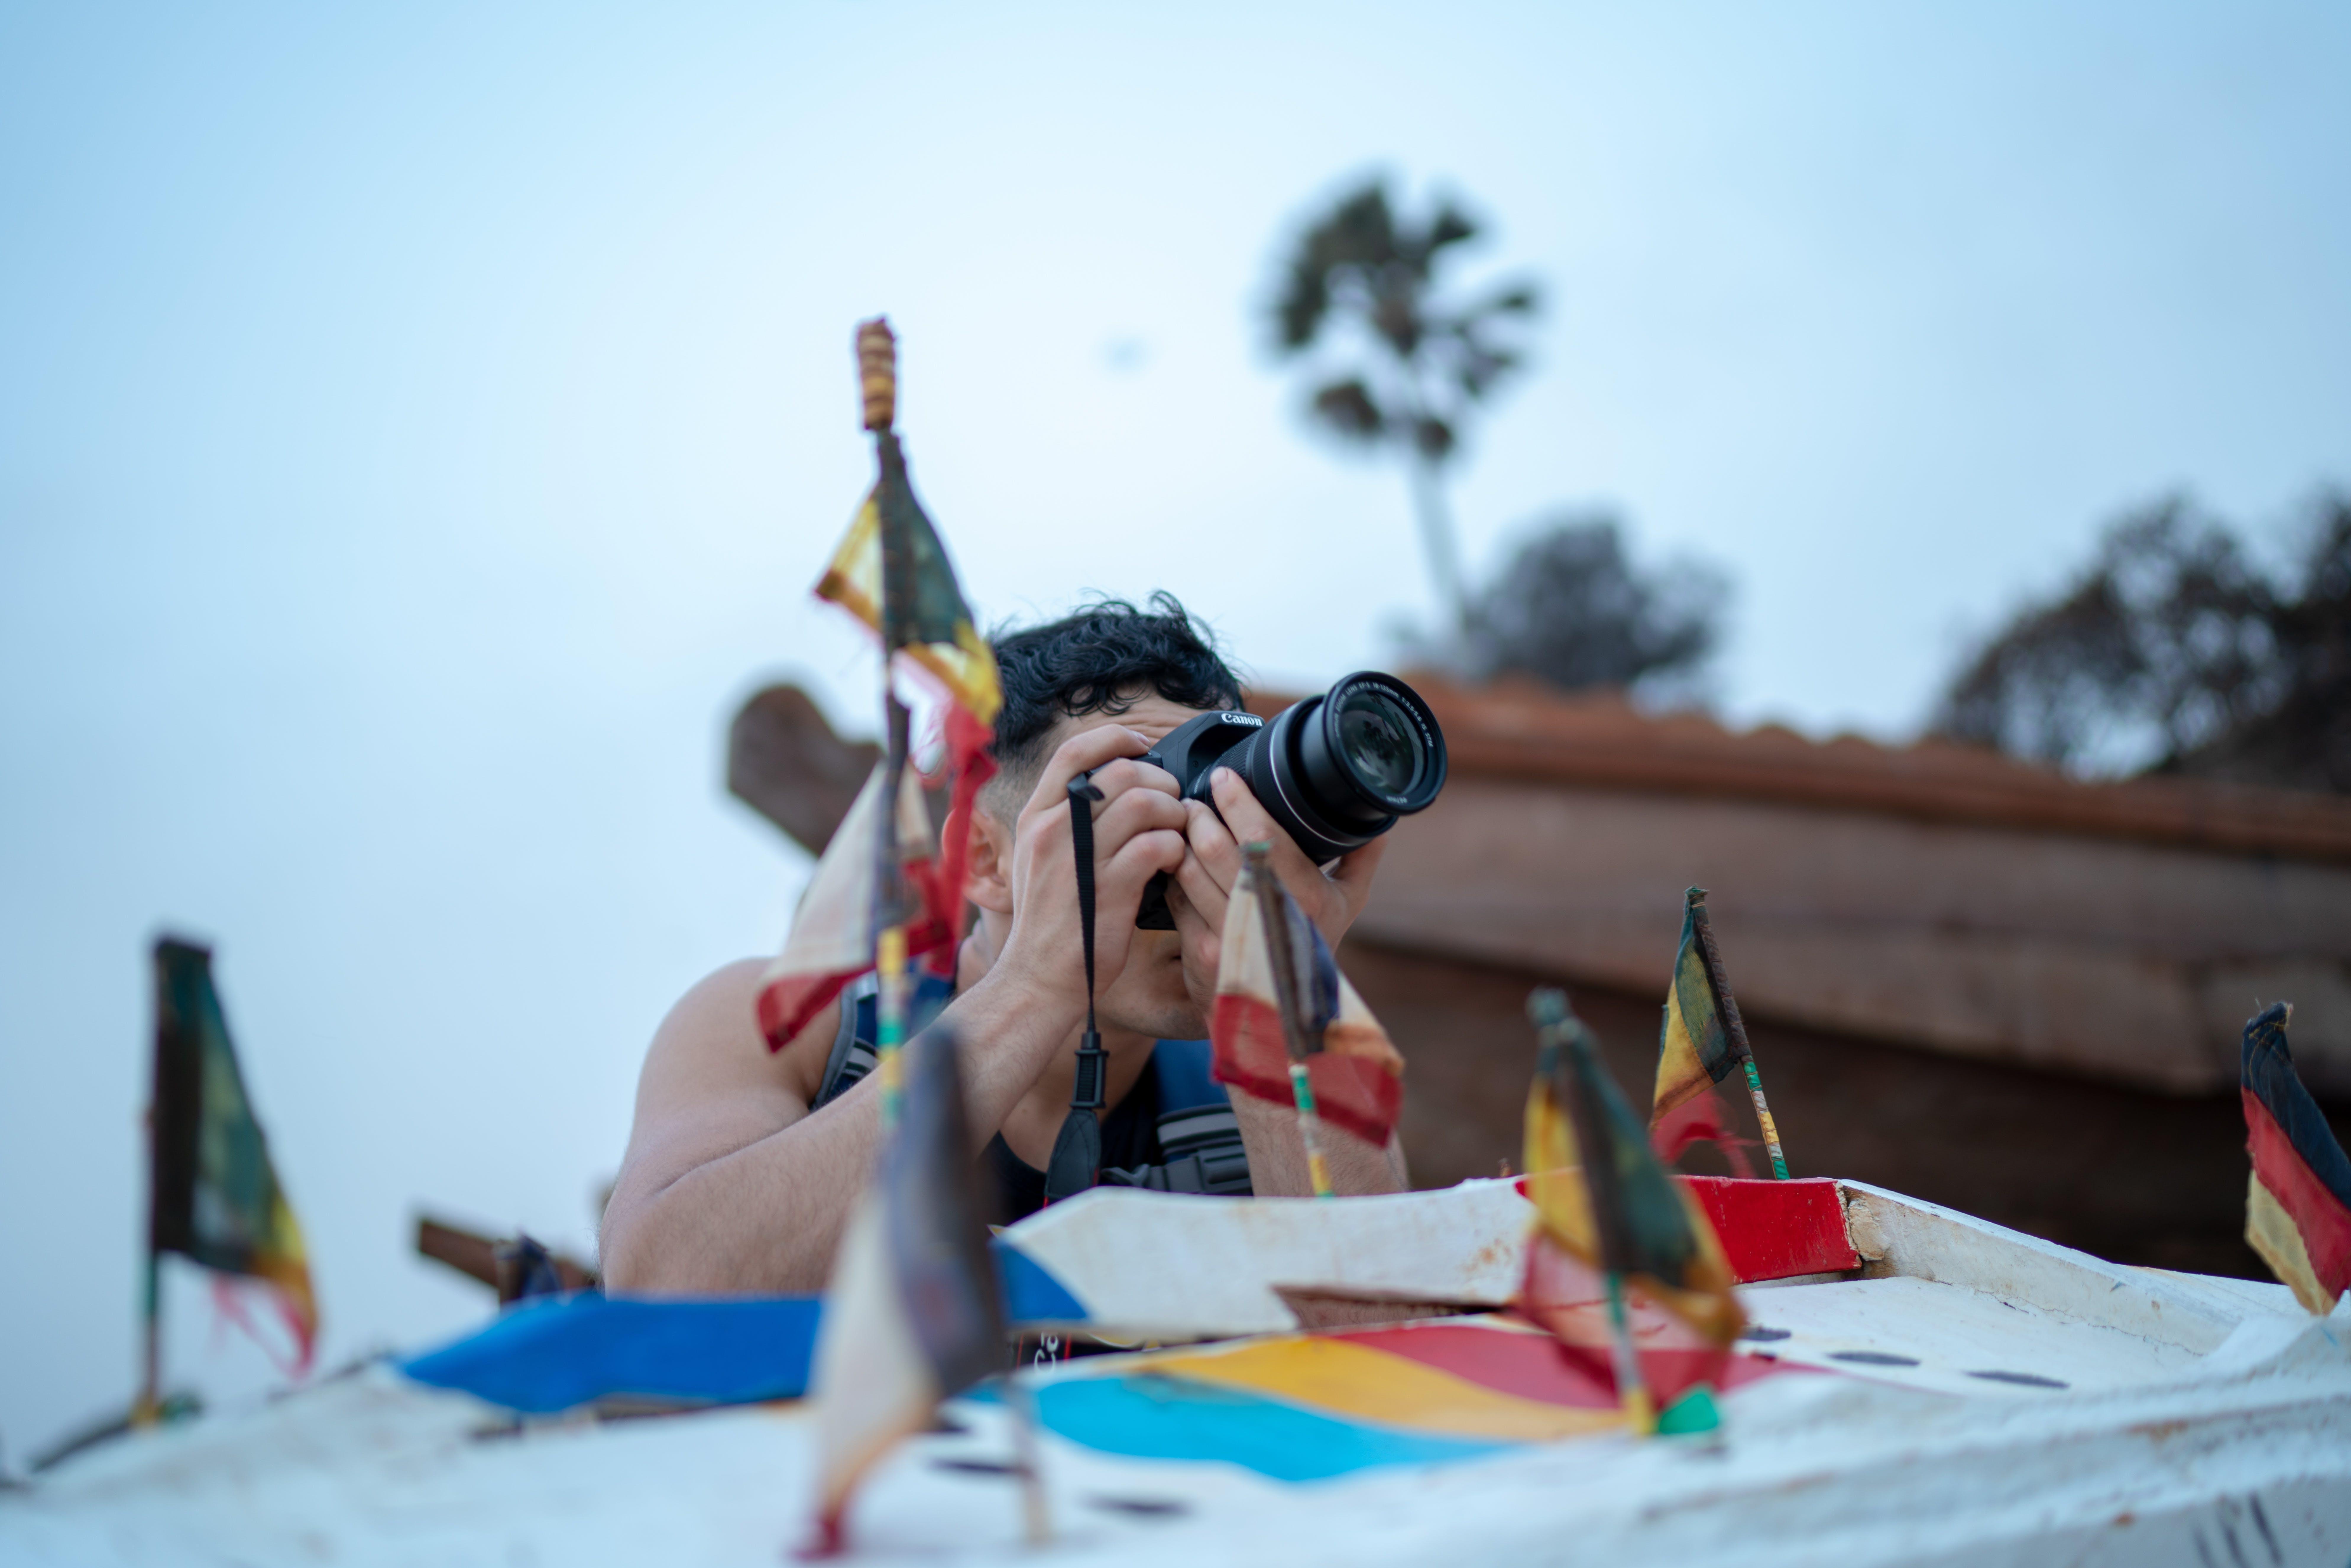 Man Taking Photo Using Dslr Camera Near Country Flag Miniatures